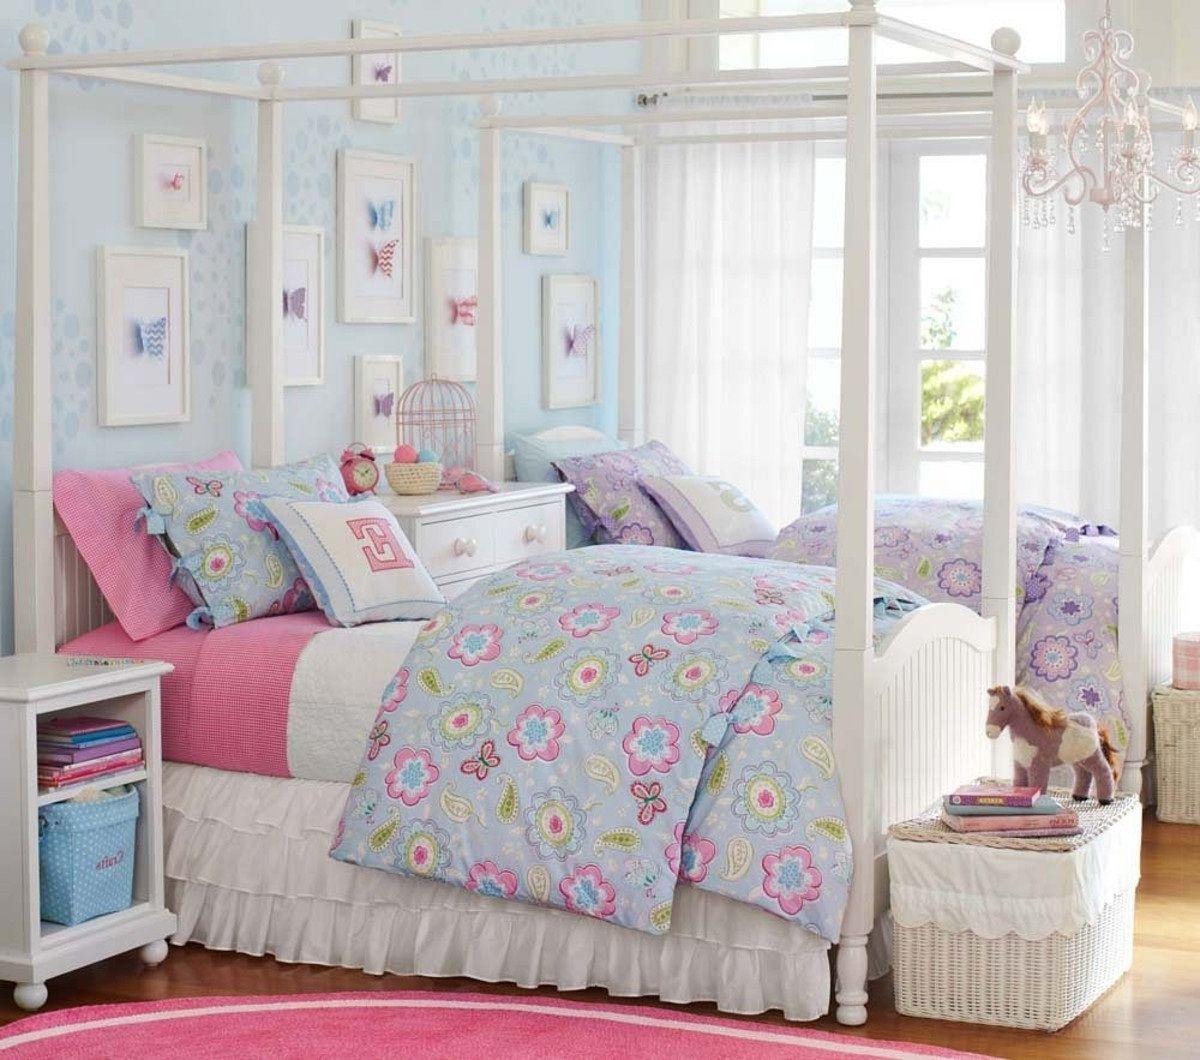 Twin loft bed craigslist   Craigslist Bunk Beds  Simple Interior Design for Bedroom Check